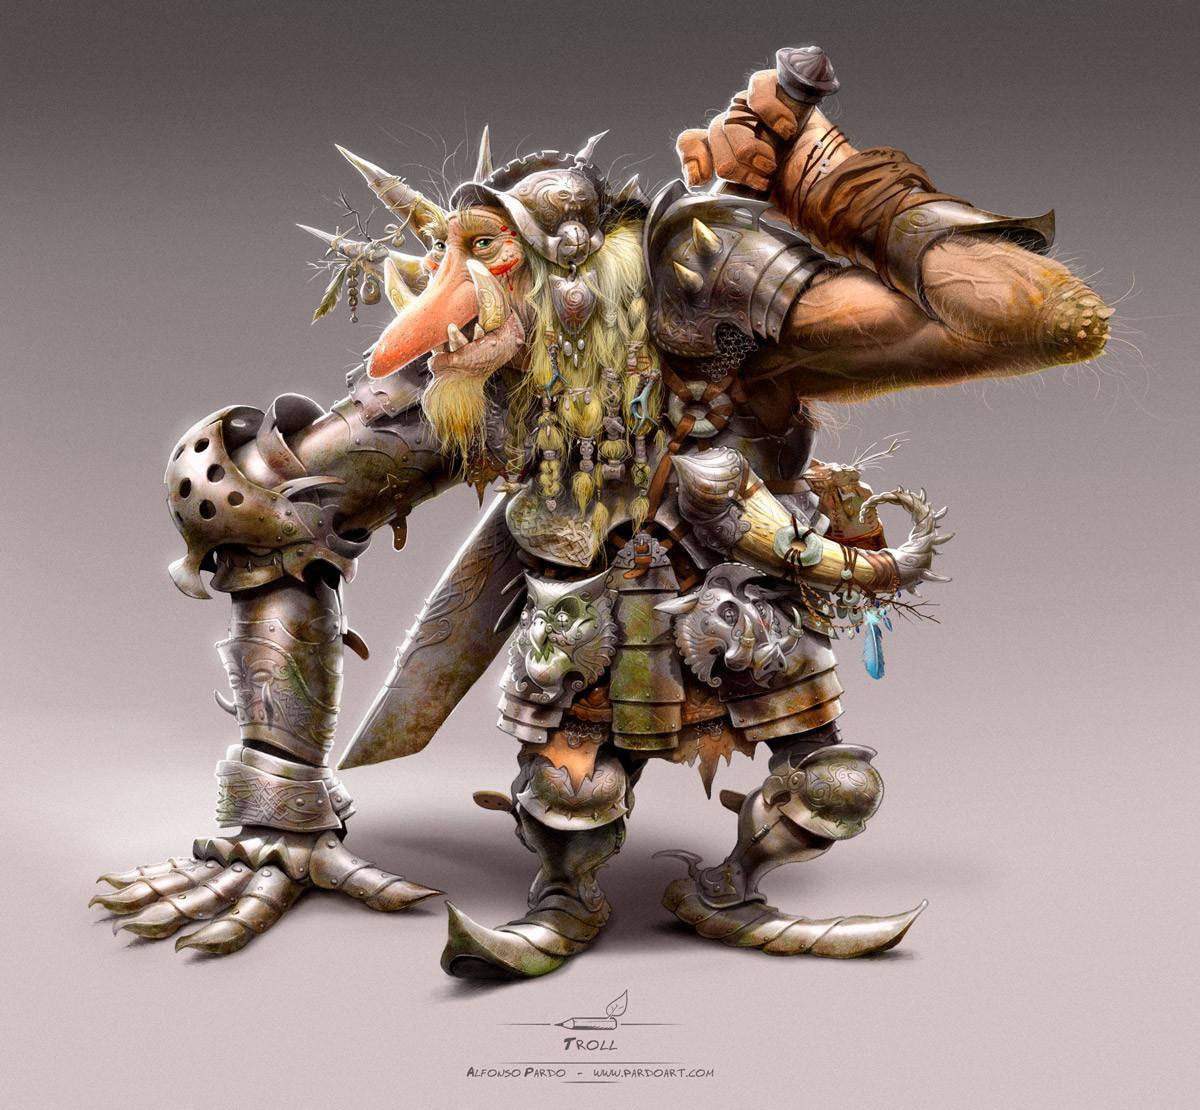 Alfonso pardo martinez troll eoghan kerrigan